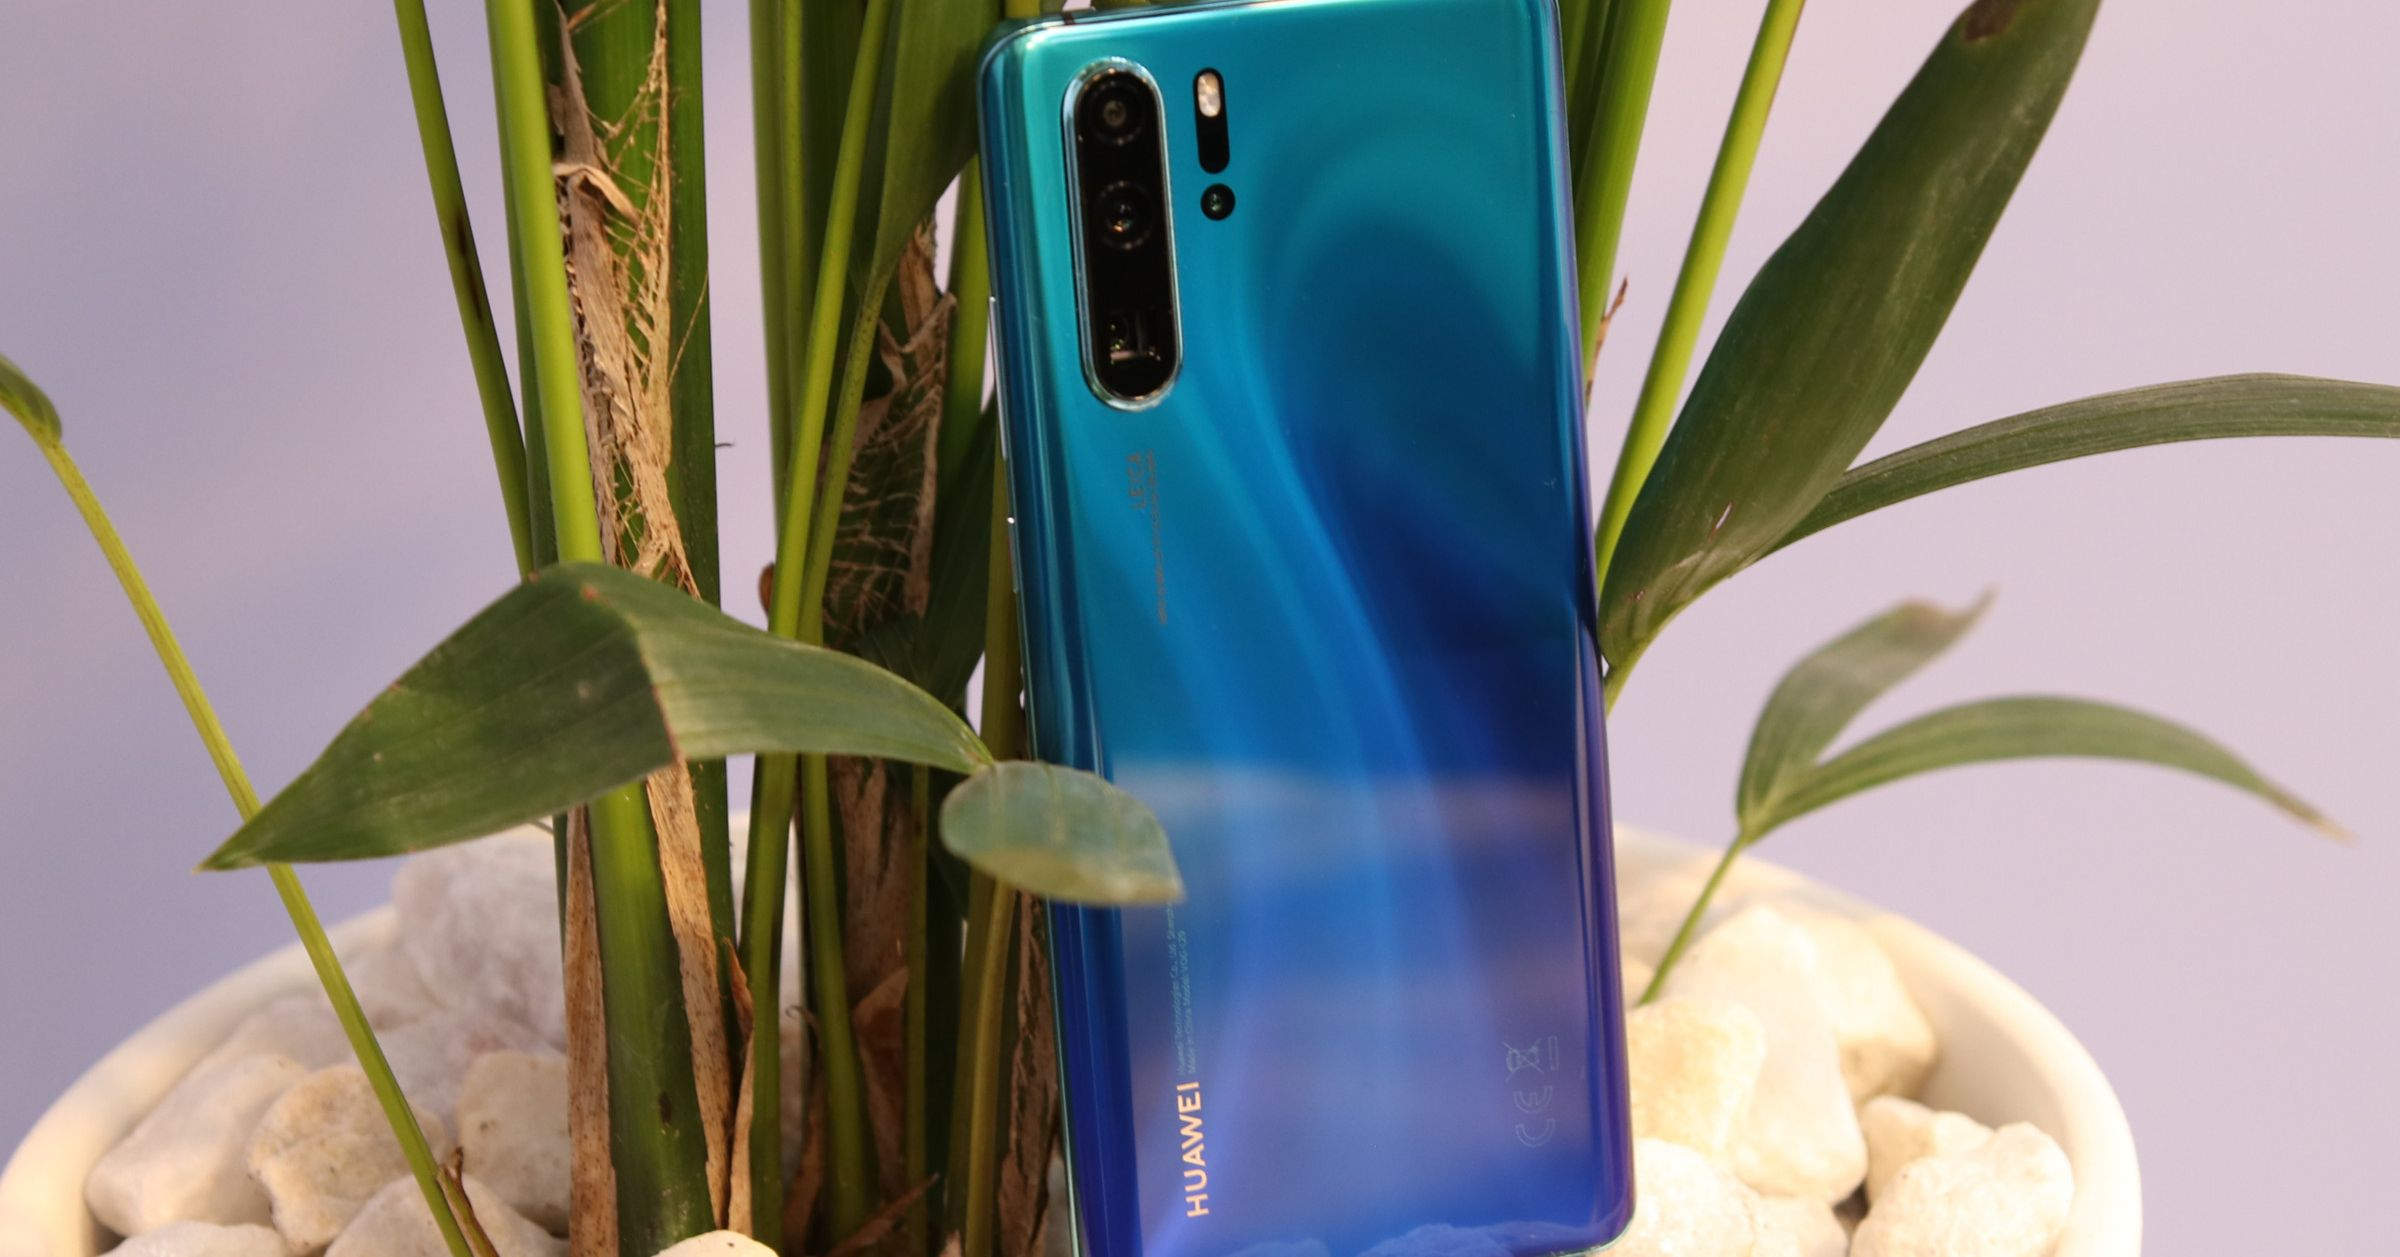 Huawei P30 Pro in Aurora